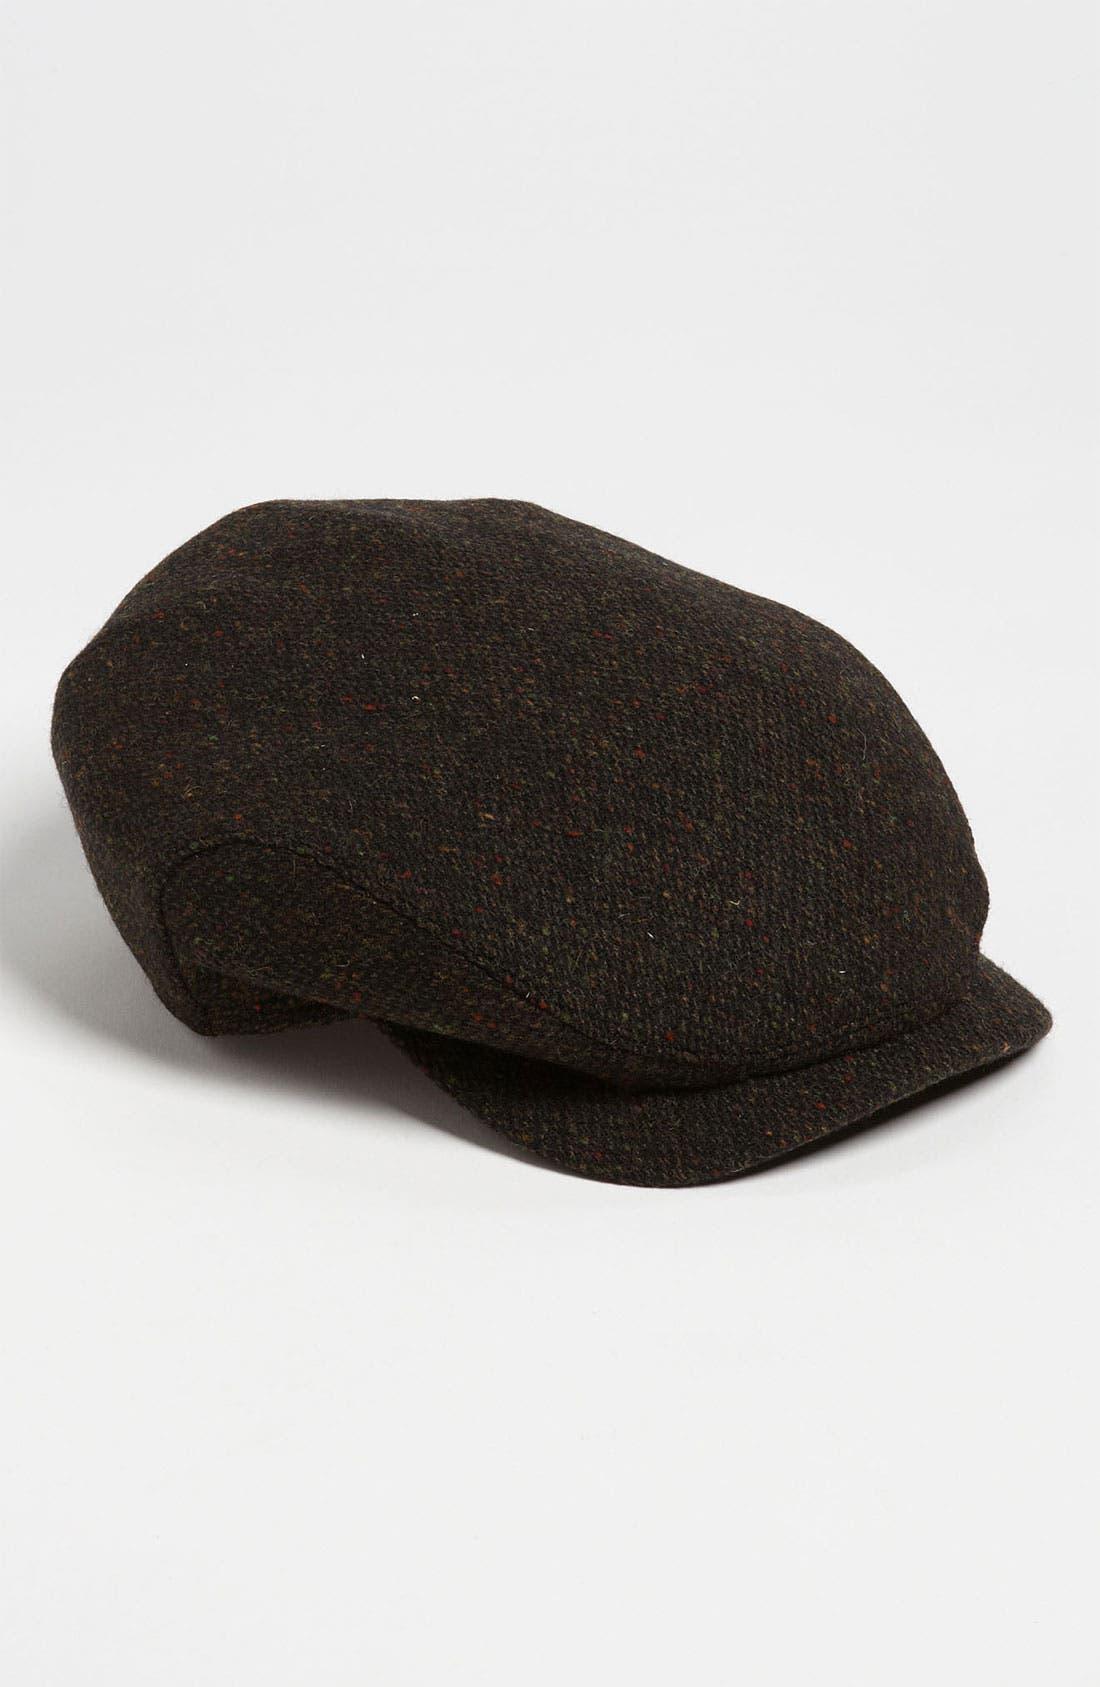 Main Image - Wigens Donegal Tweed Earflap Driving Cap